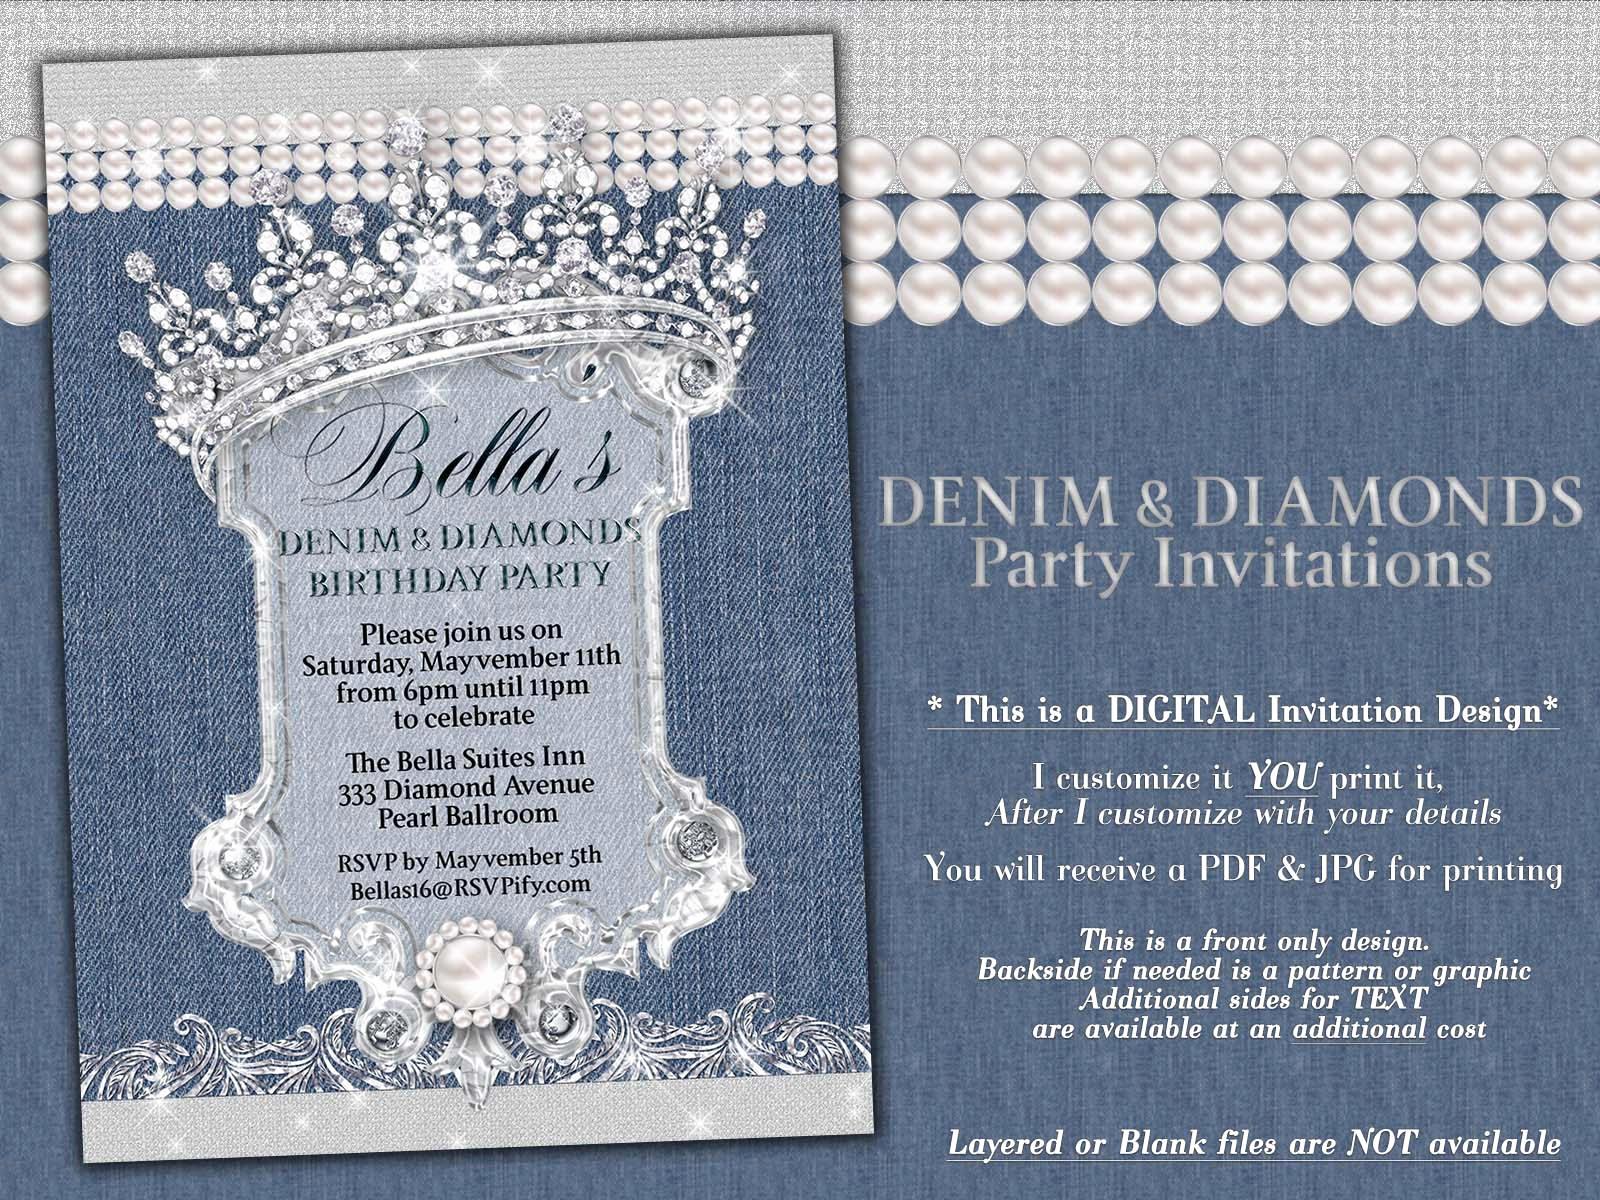 Denim and Diamonds Invitation Beautiful Denim and Diamonds Sweet 16 Invitations Western Birthday